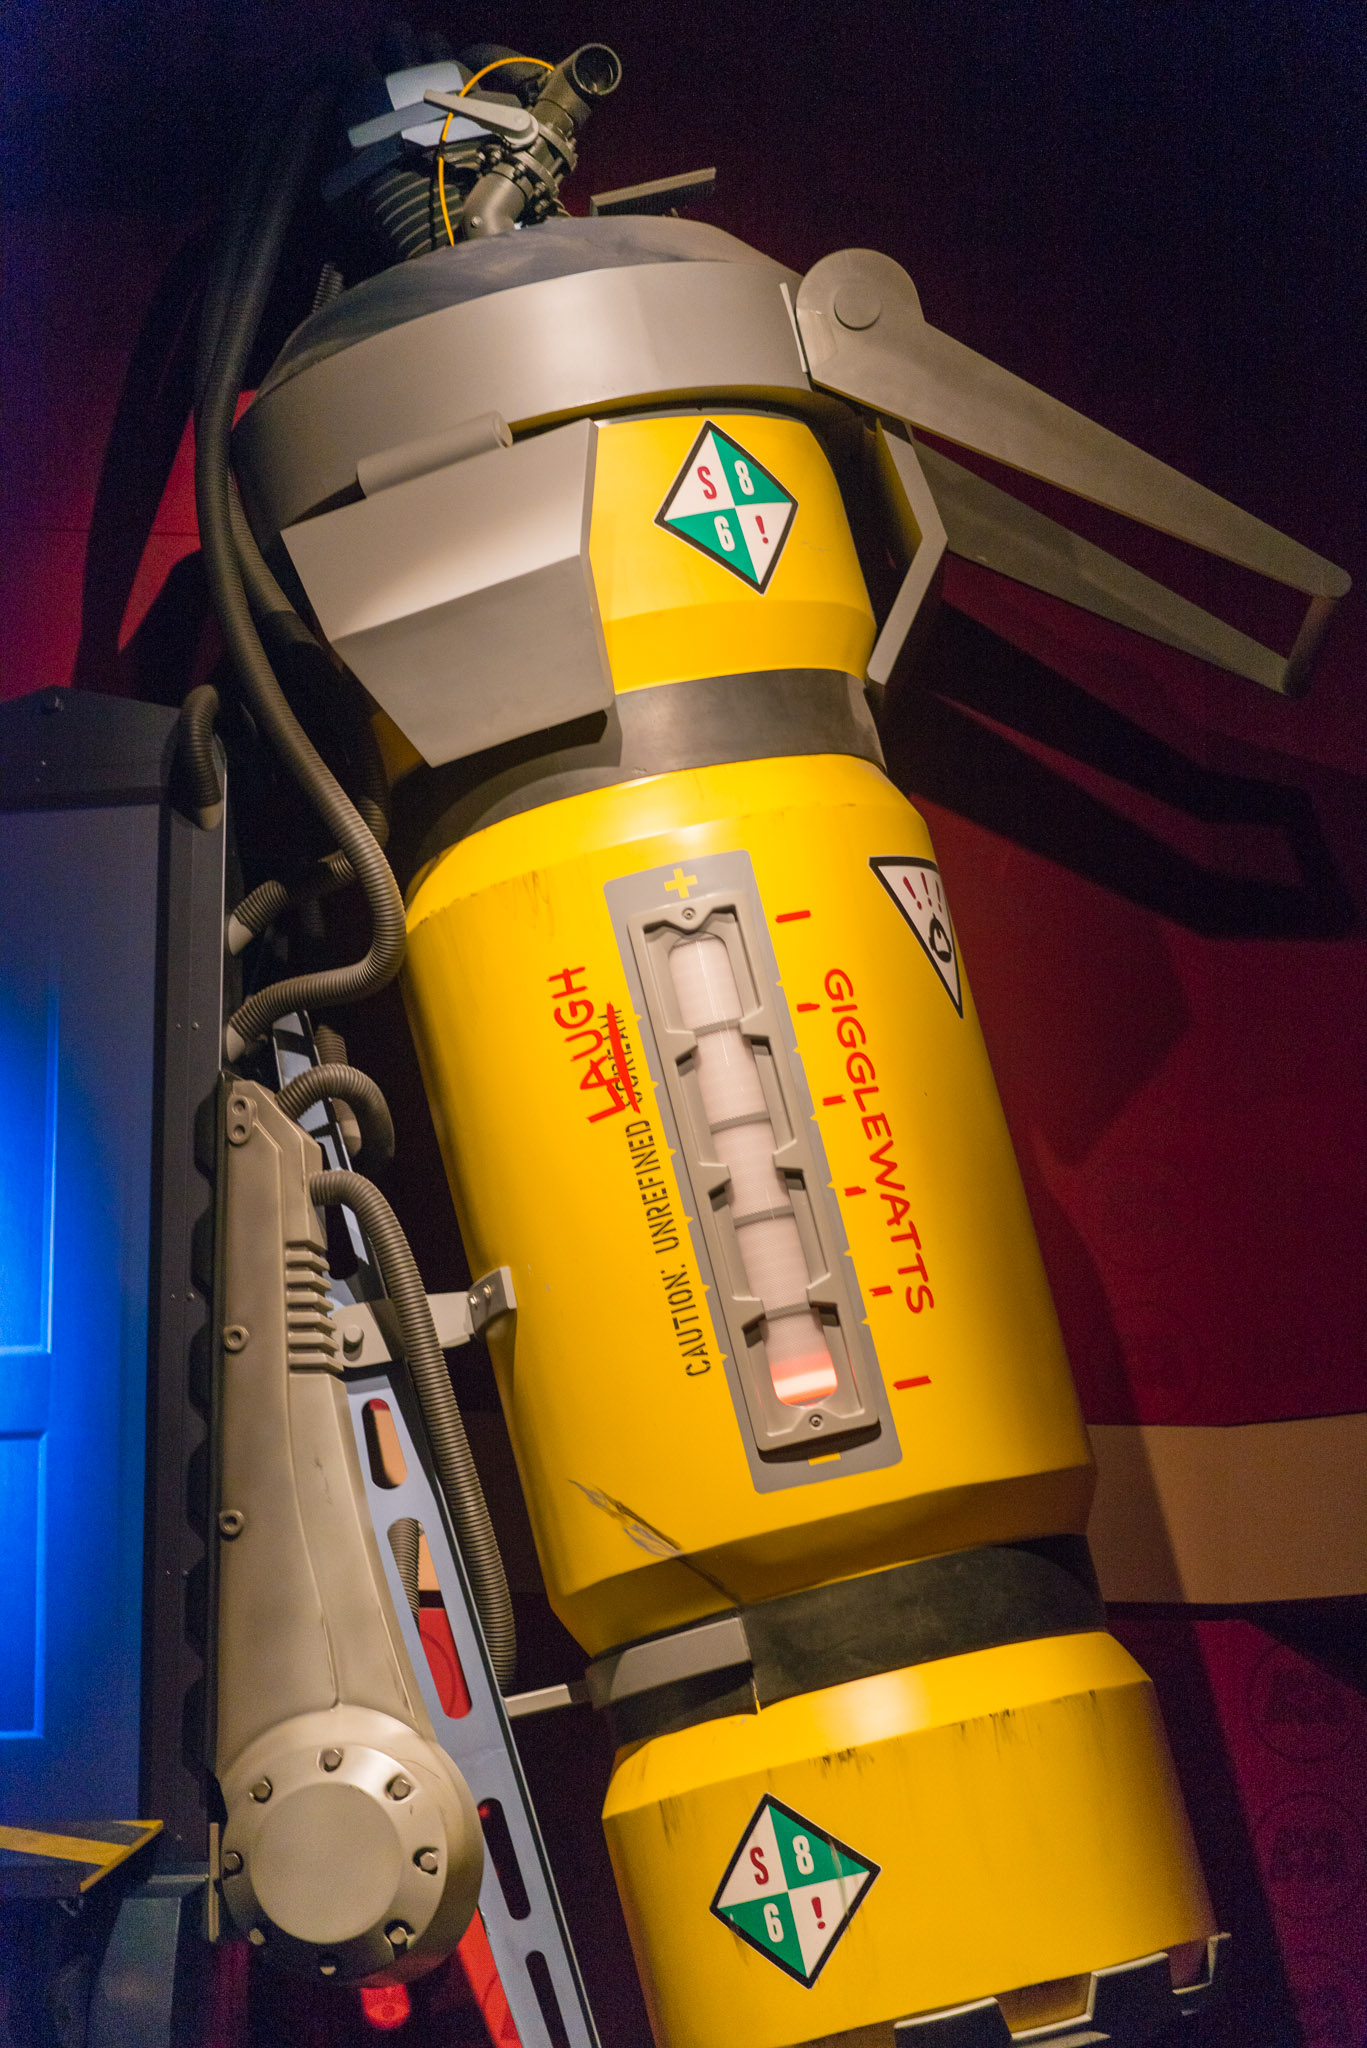 Gigglewatts Meter - Walt Disney World Magic Kingdom